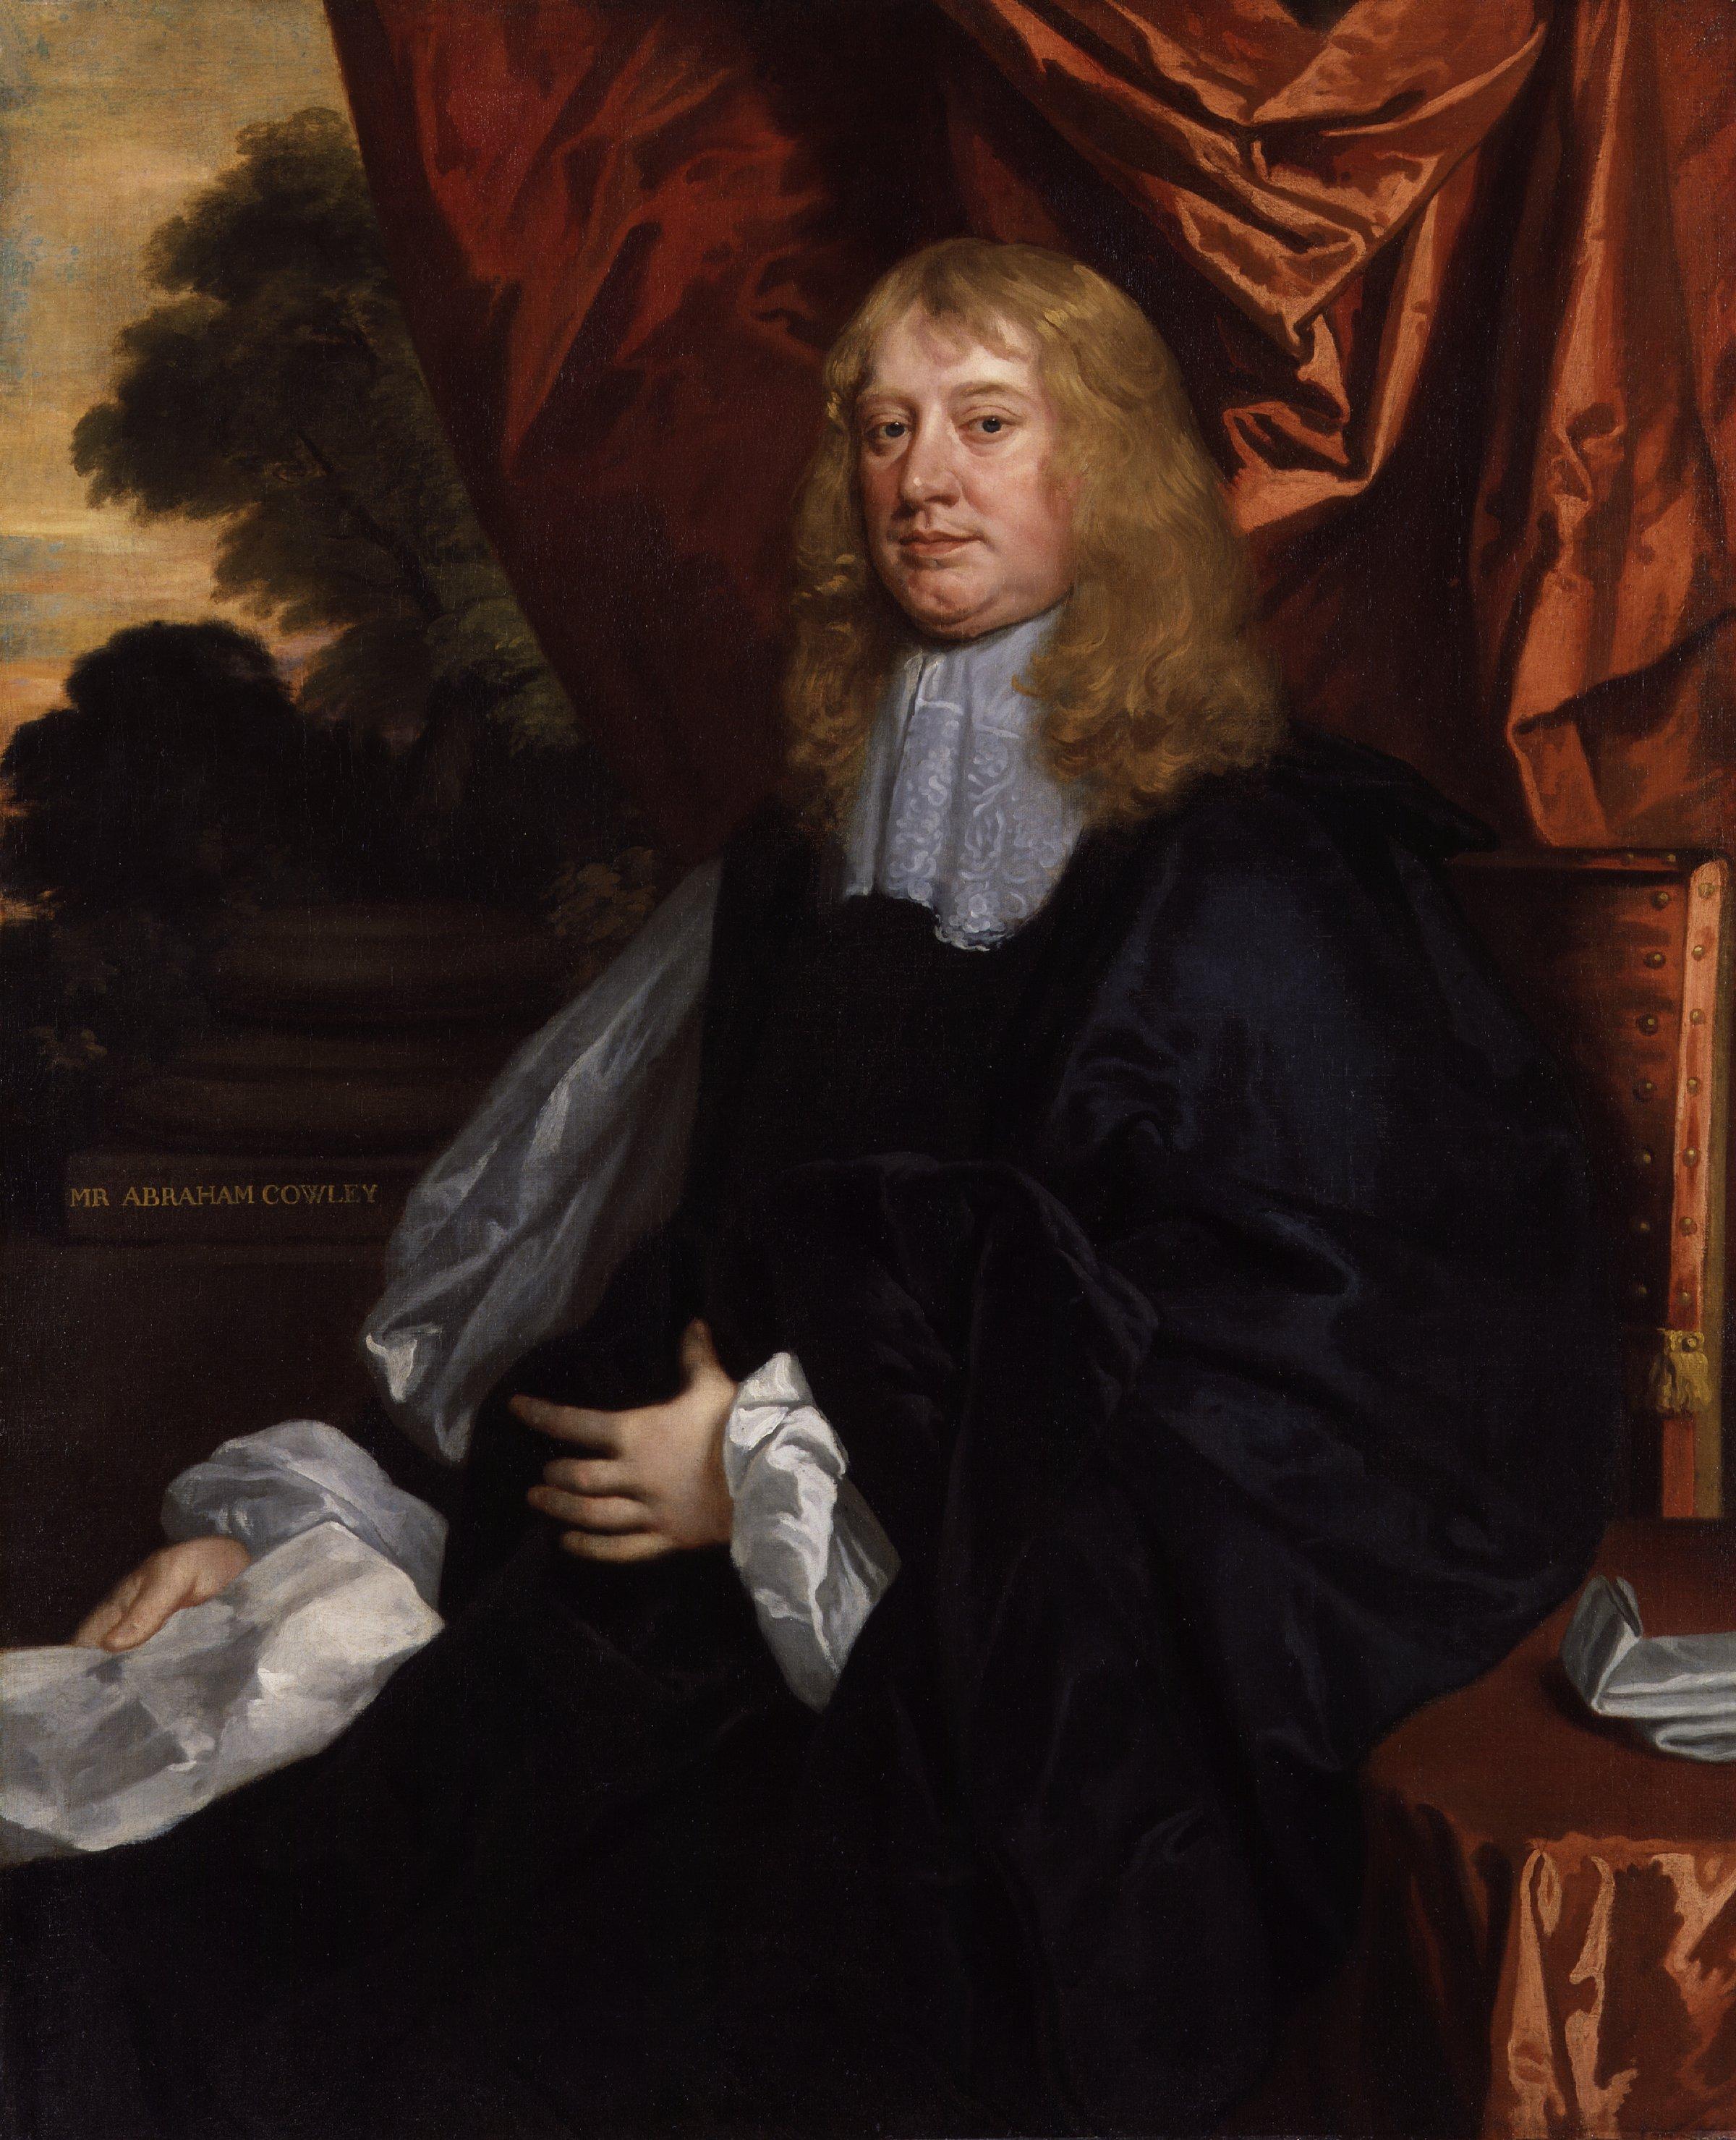 John donne as a metaphysical poet essays